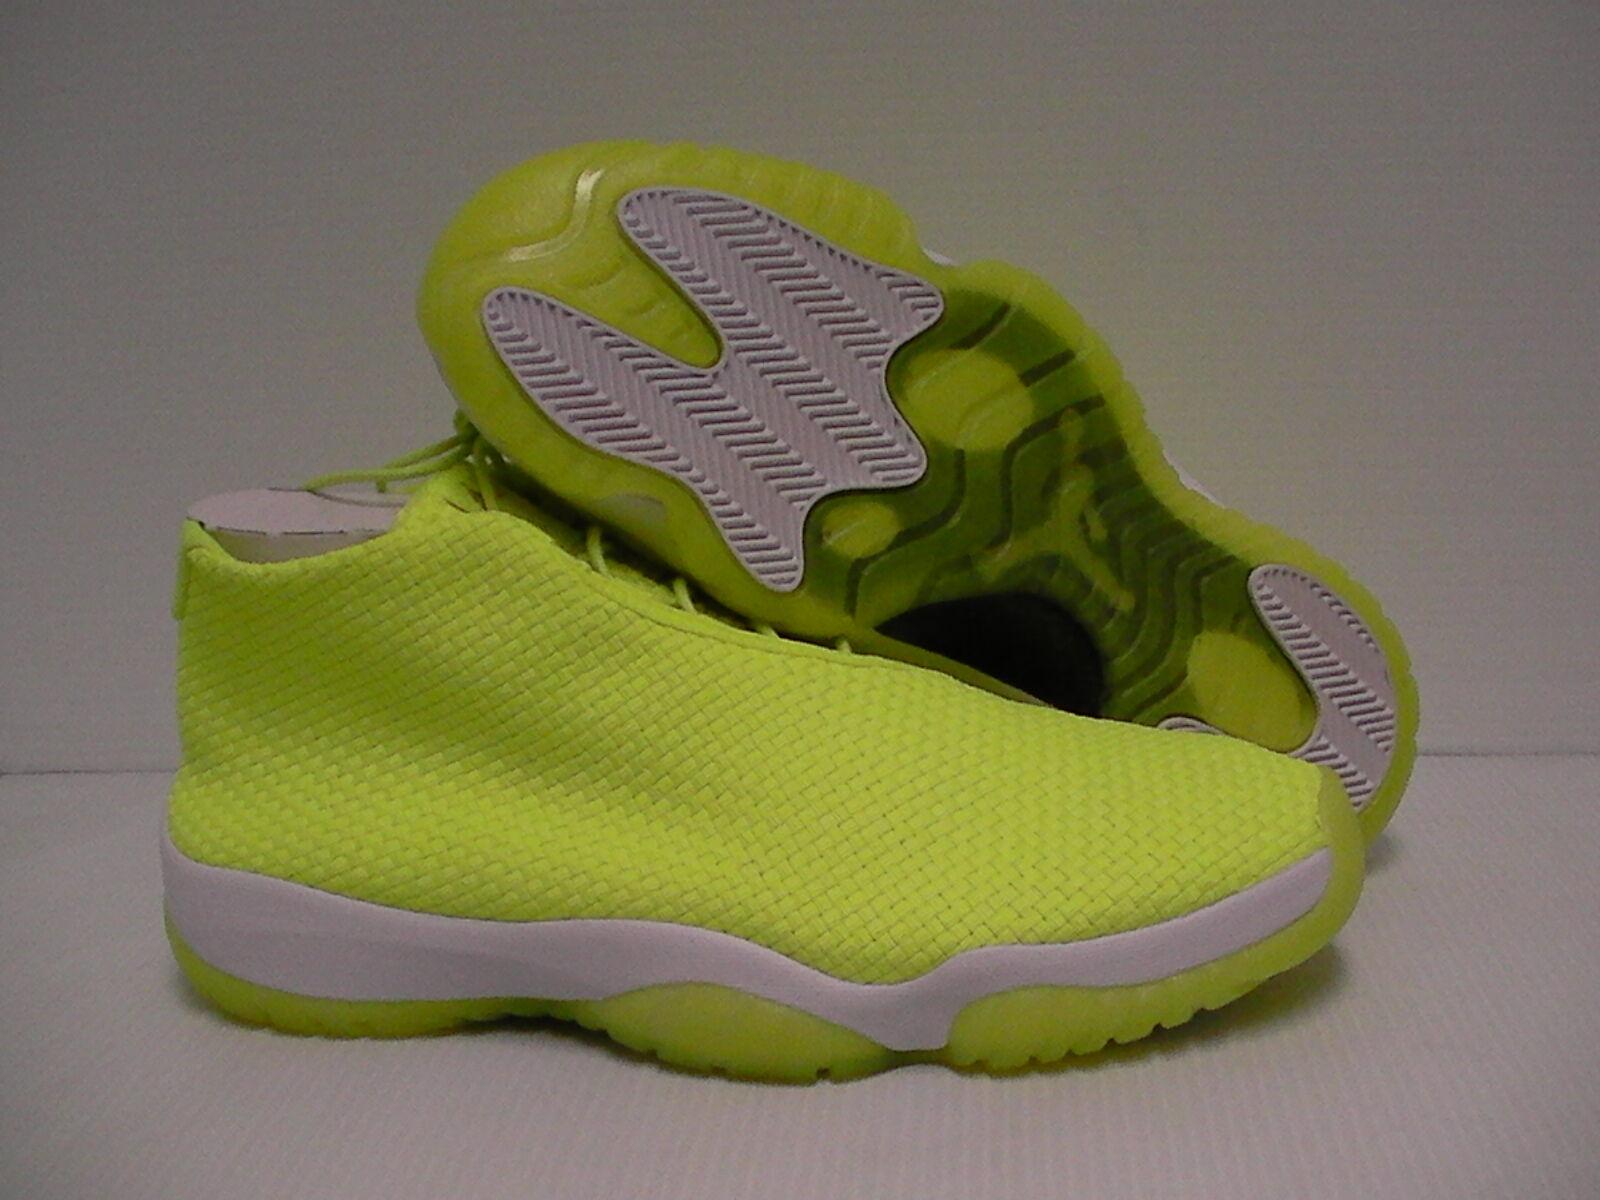 Mens Jordan future basketball shoes volt color size 10.5 new